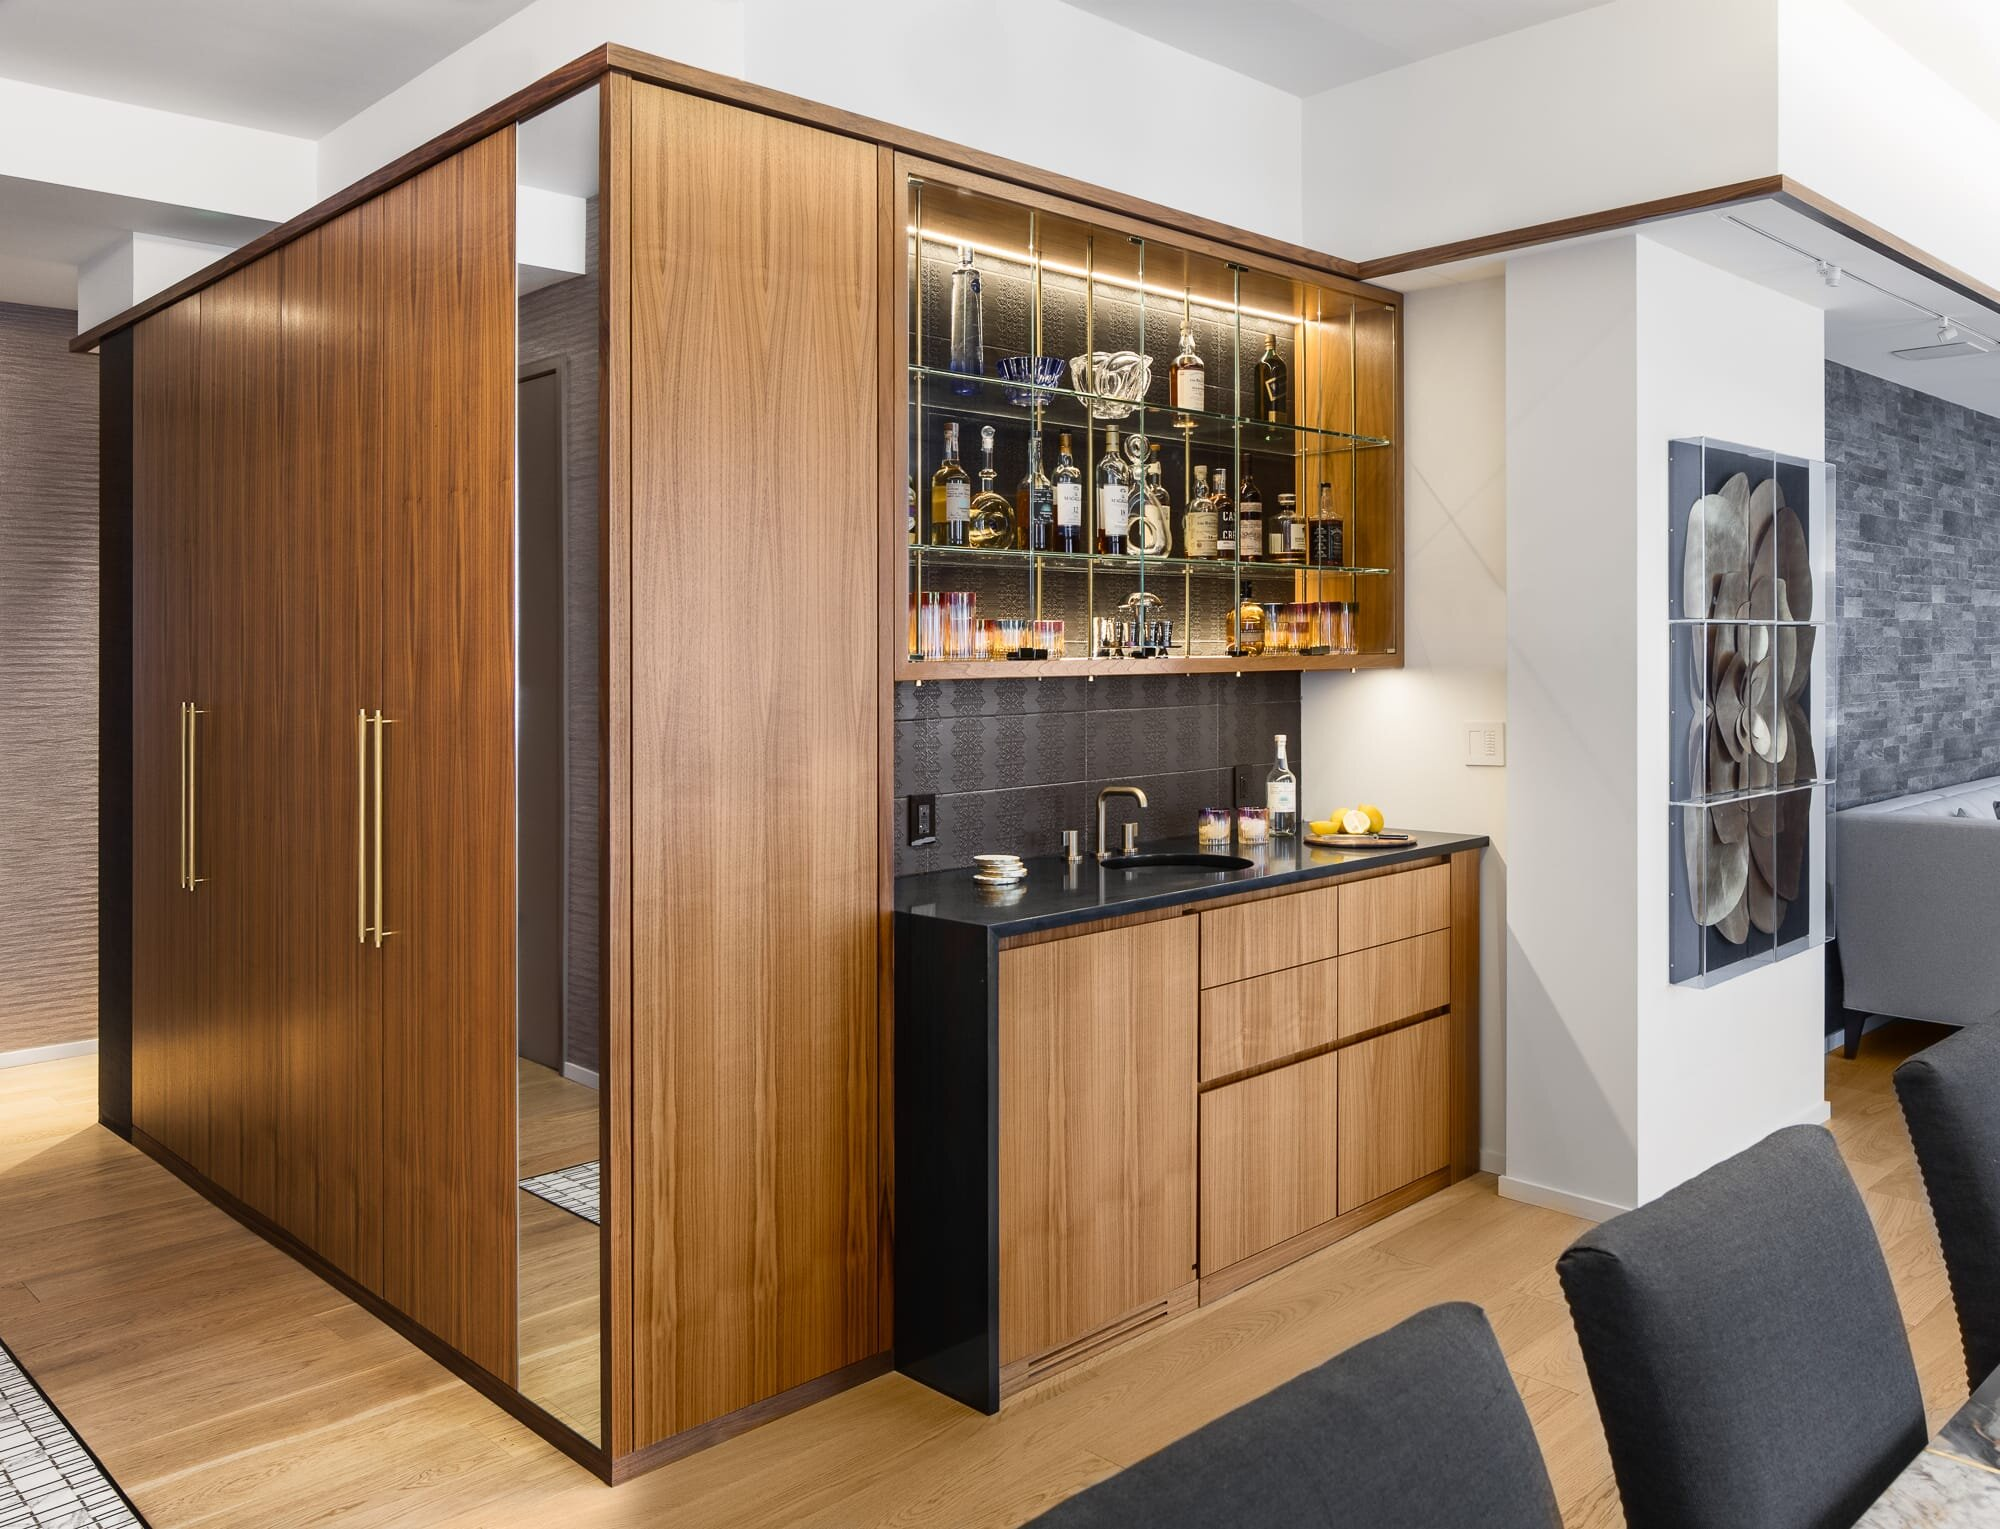 Corner bar designed by Andrew Wilkinson Architect